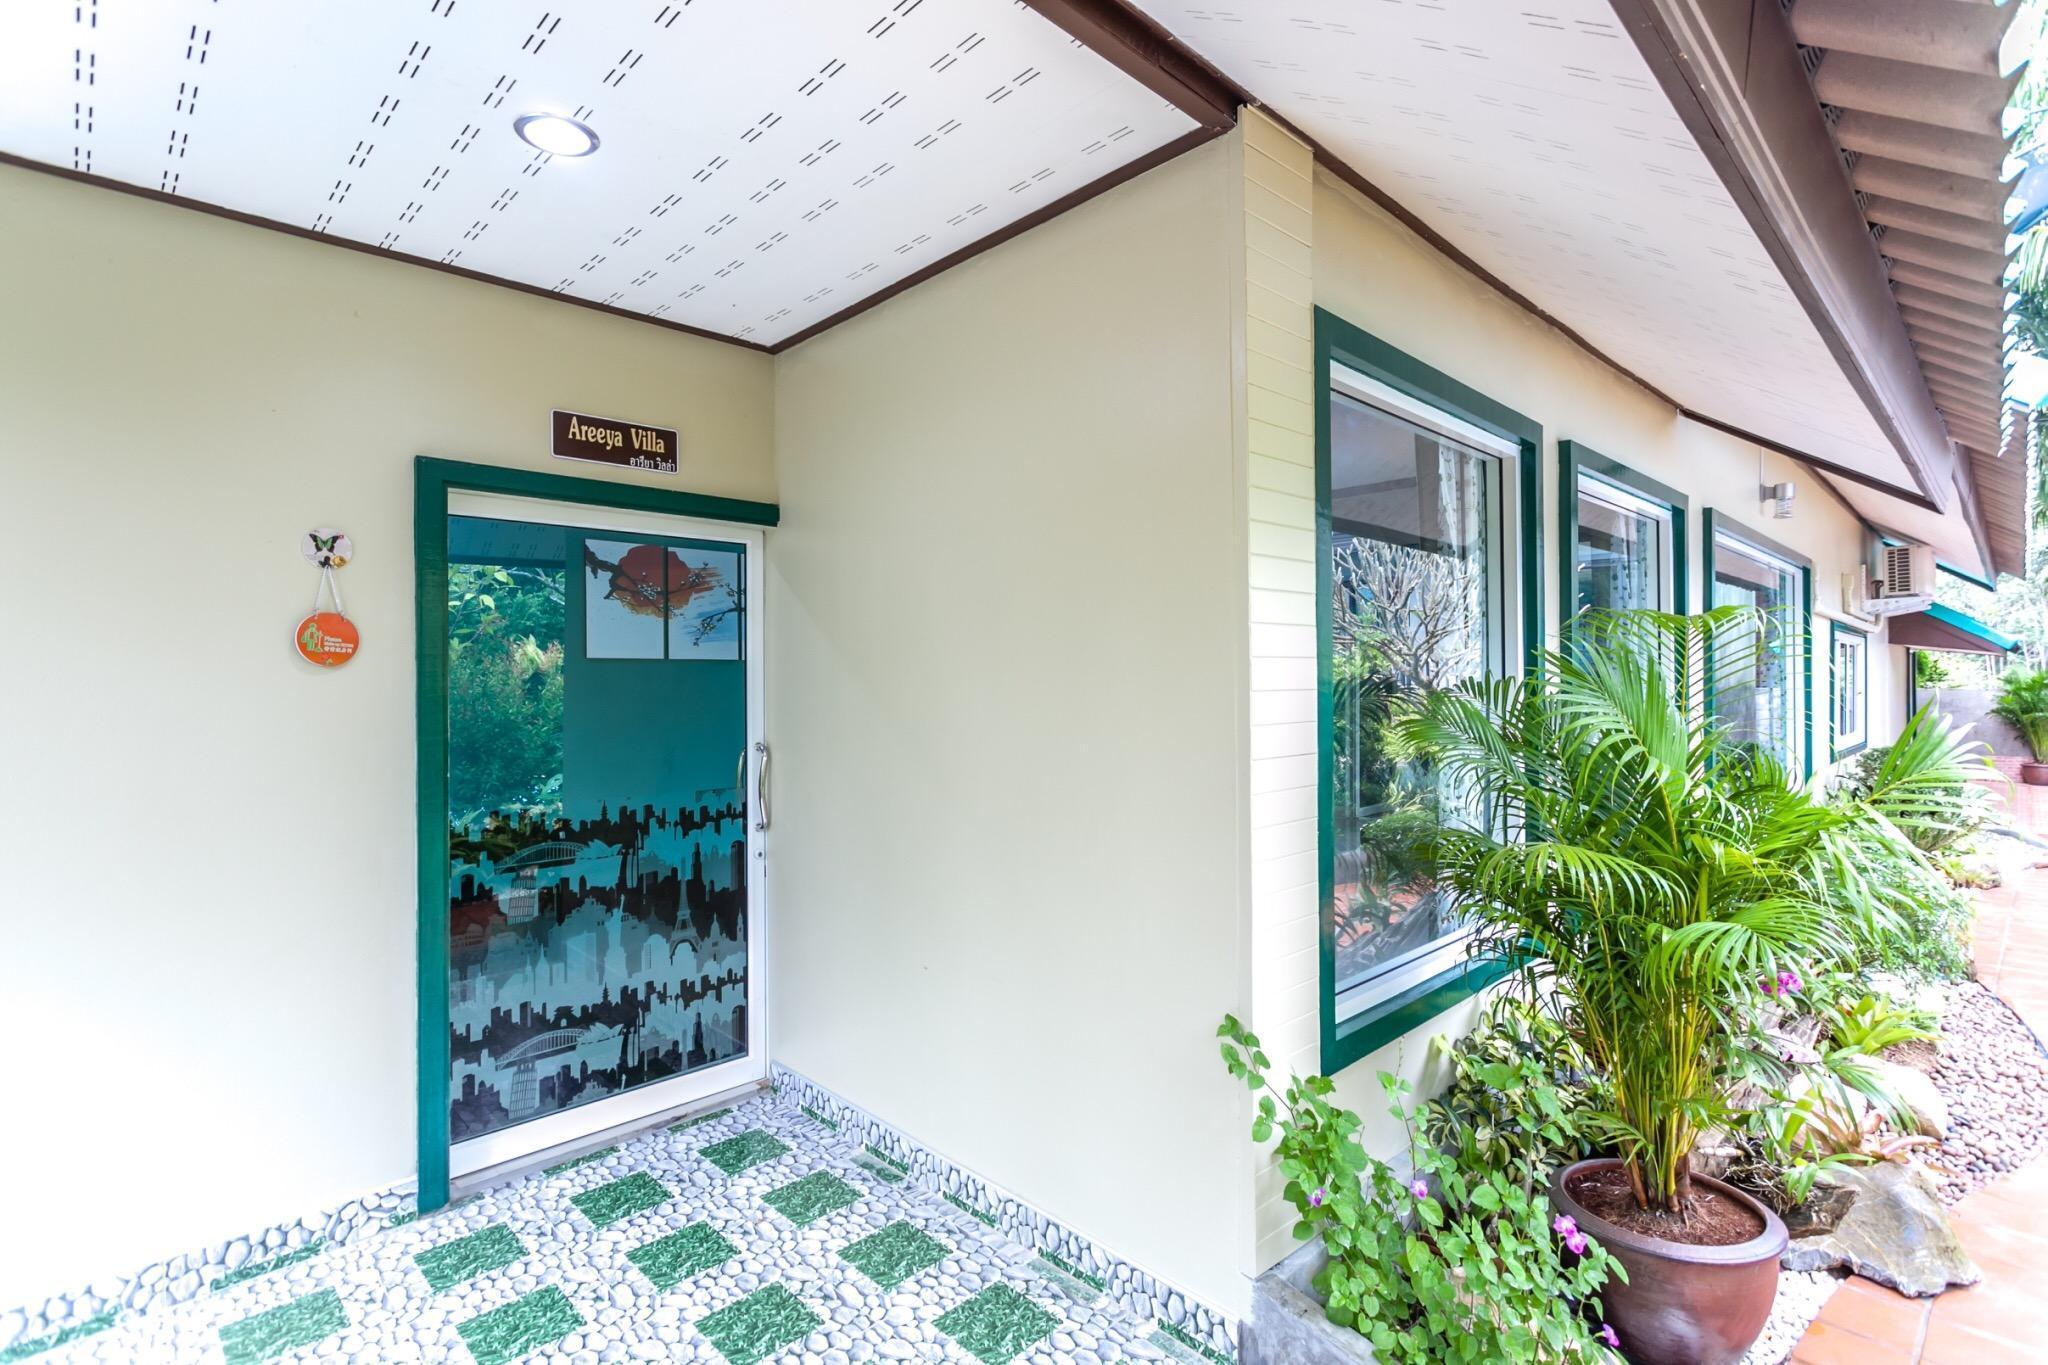 Areeya Phu Beach Resort (Areeya Villa) สตูดิโอ บ้านเดี่ยว 3 ห้องน้ำส่วนตัว ขนาด 128 ตร.ม. – อ่าวนาง